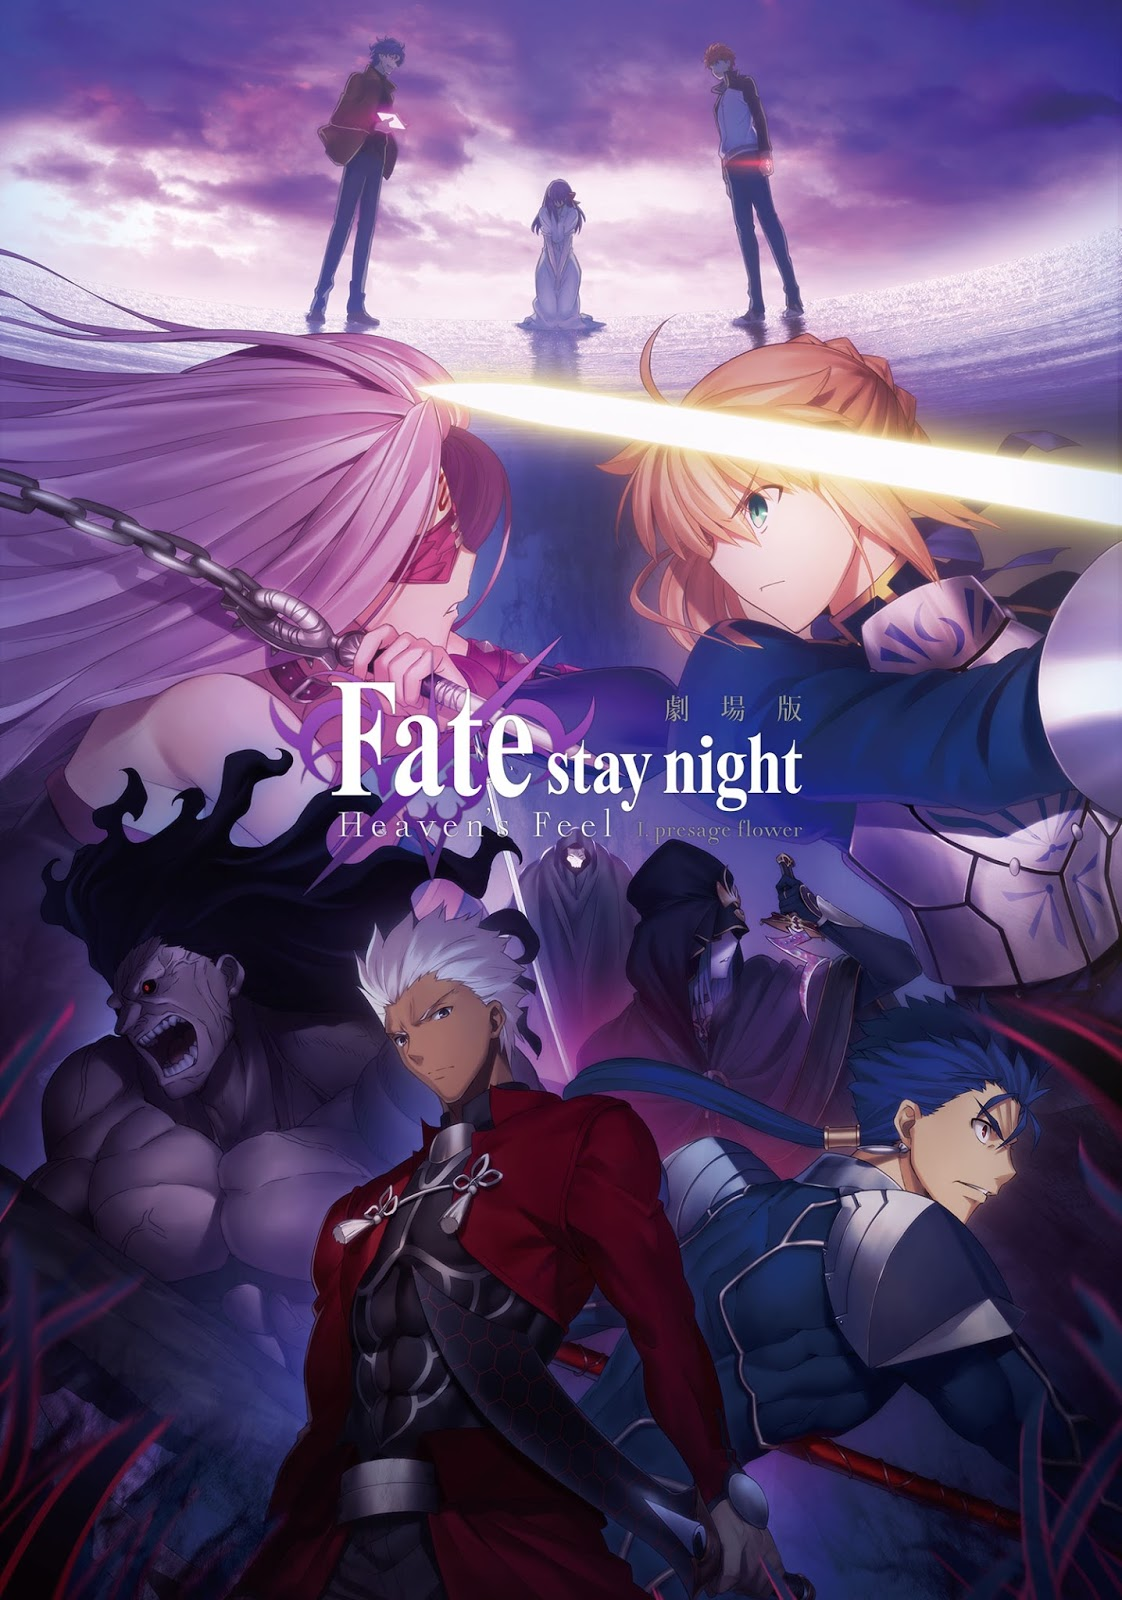 Último Trailer de Fate/Stay Night Heavens Feel I - Presage Flower